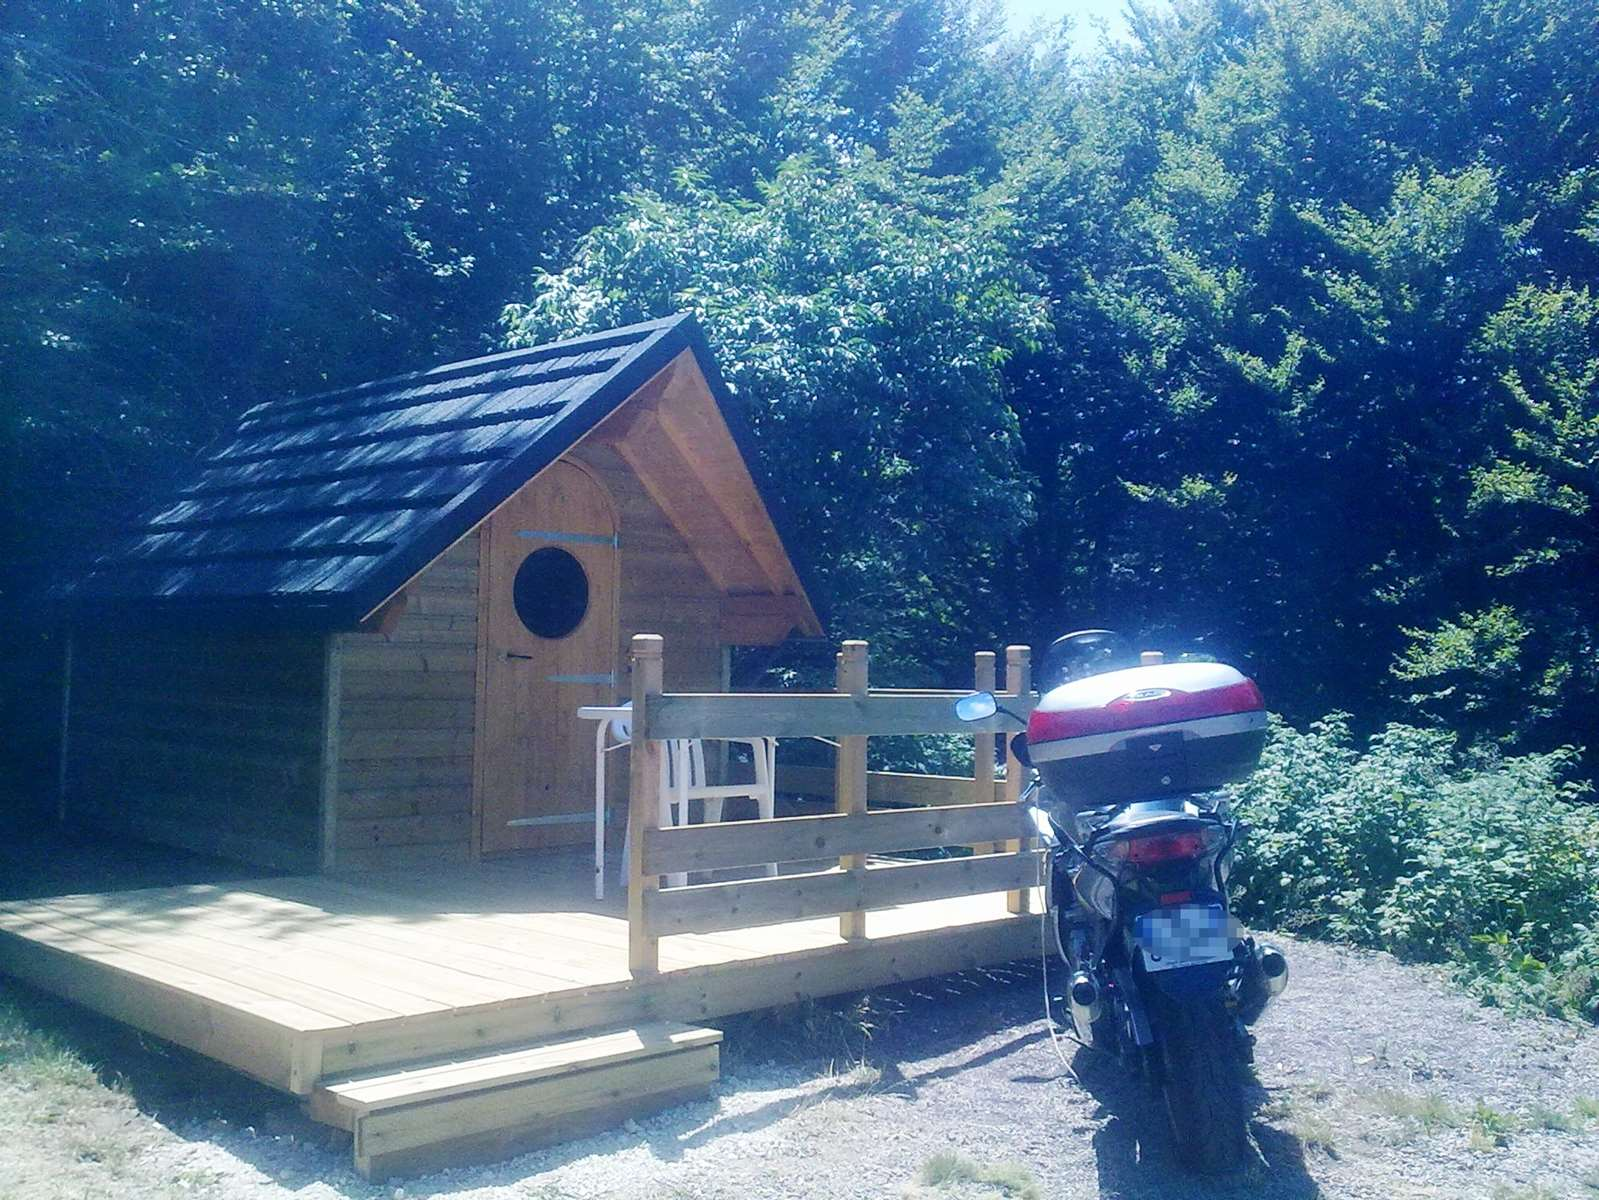 auvergne-camping mont dore-cabane 3